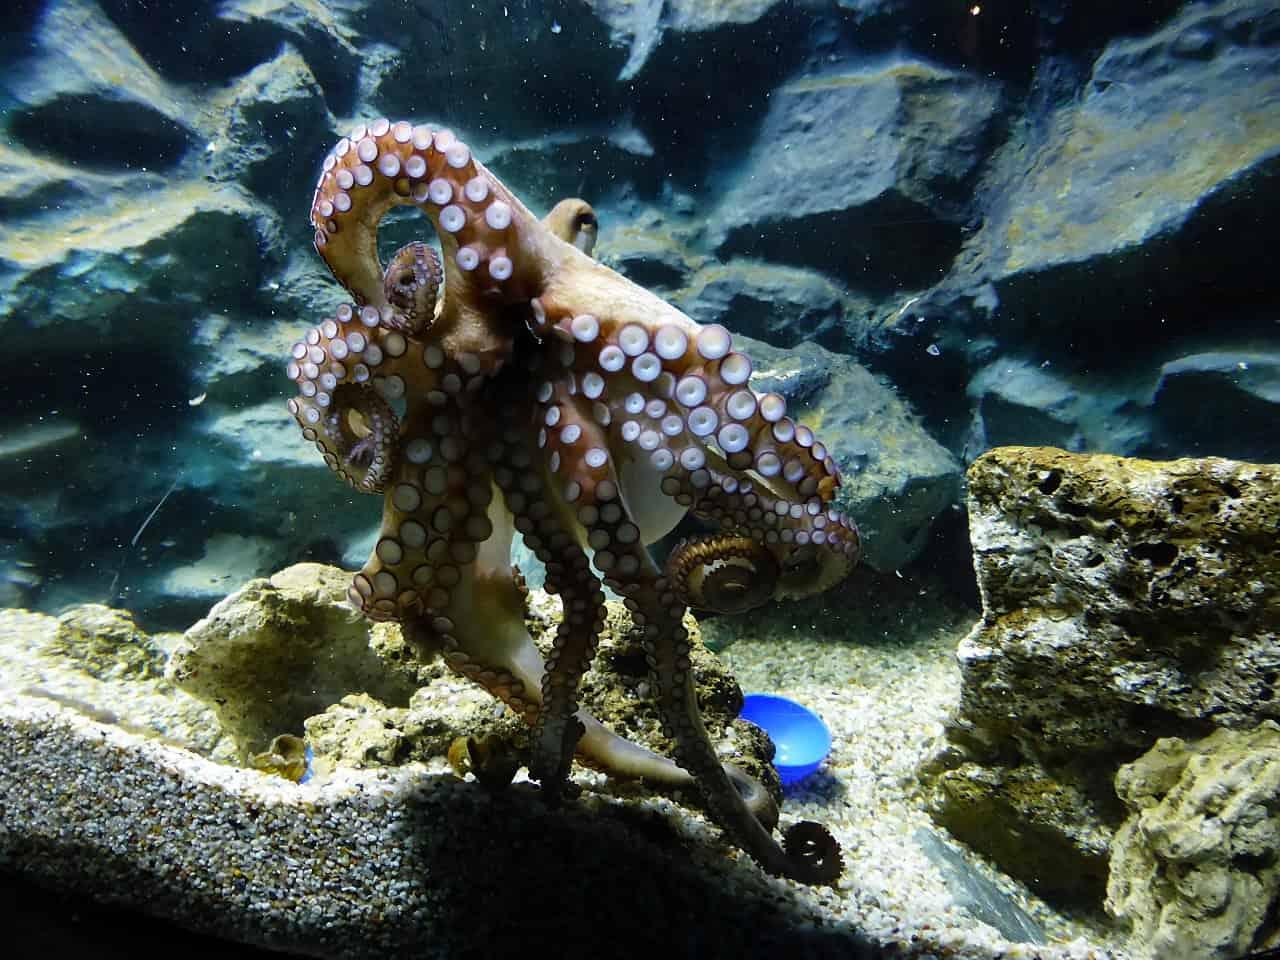 vulgaris octopus, octopus facts